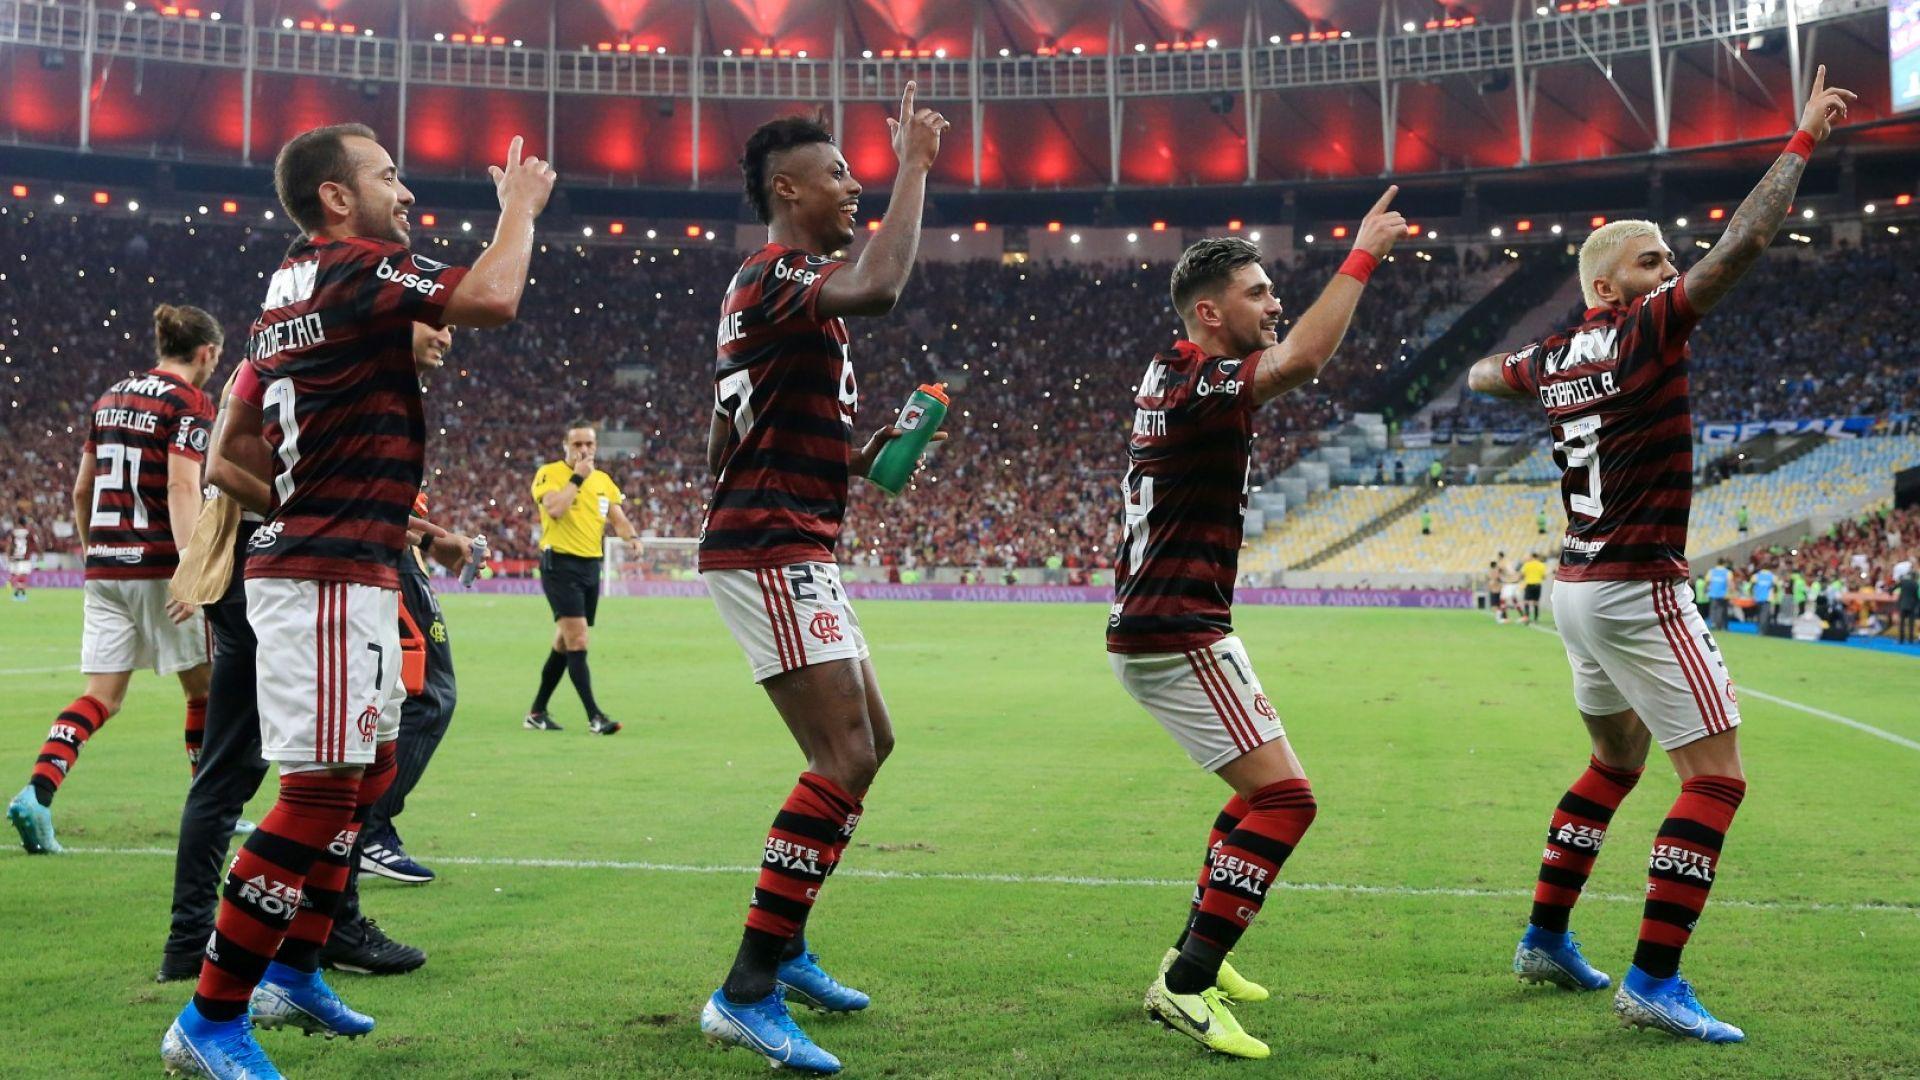 """Маракана"" пее, Копакабана лудее - голямата любов на Рио е на финал след 38 години"